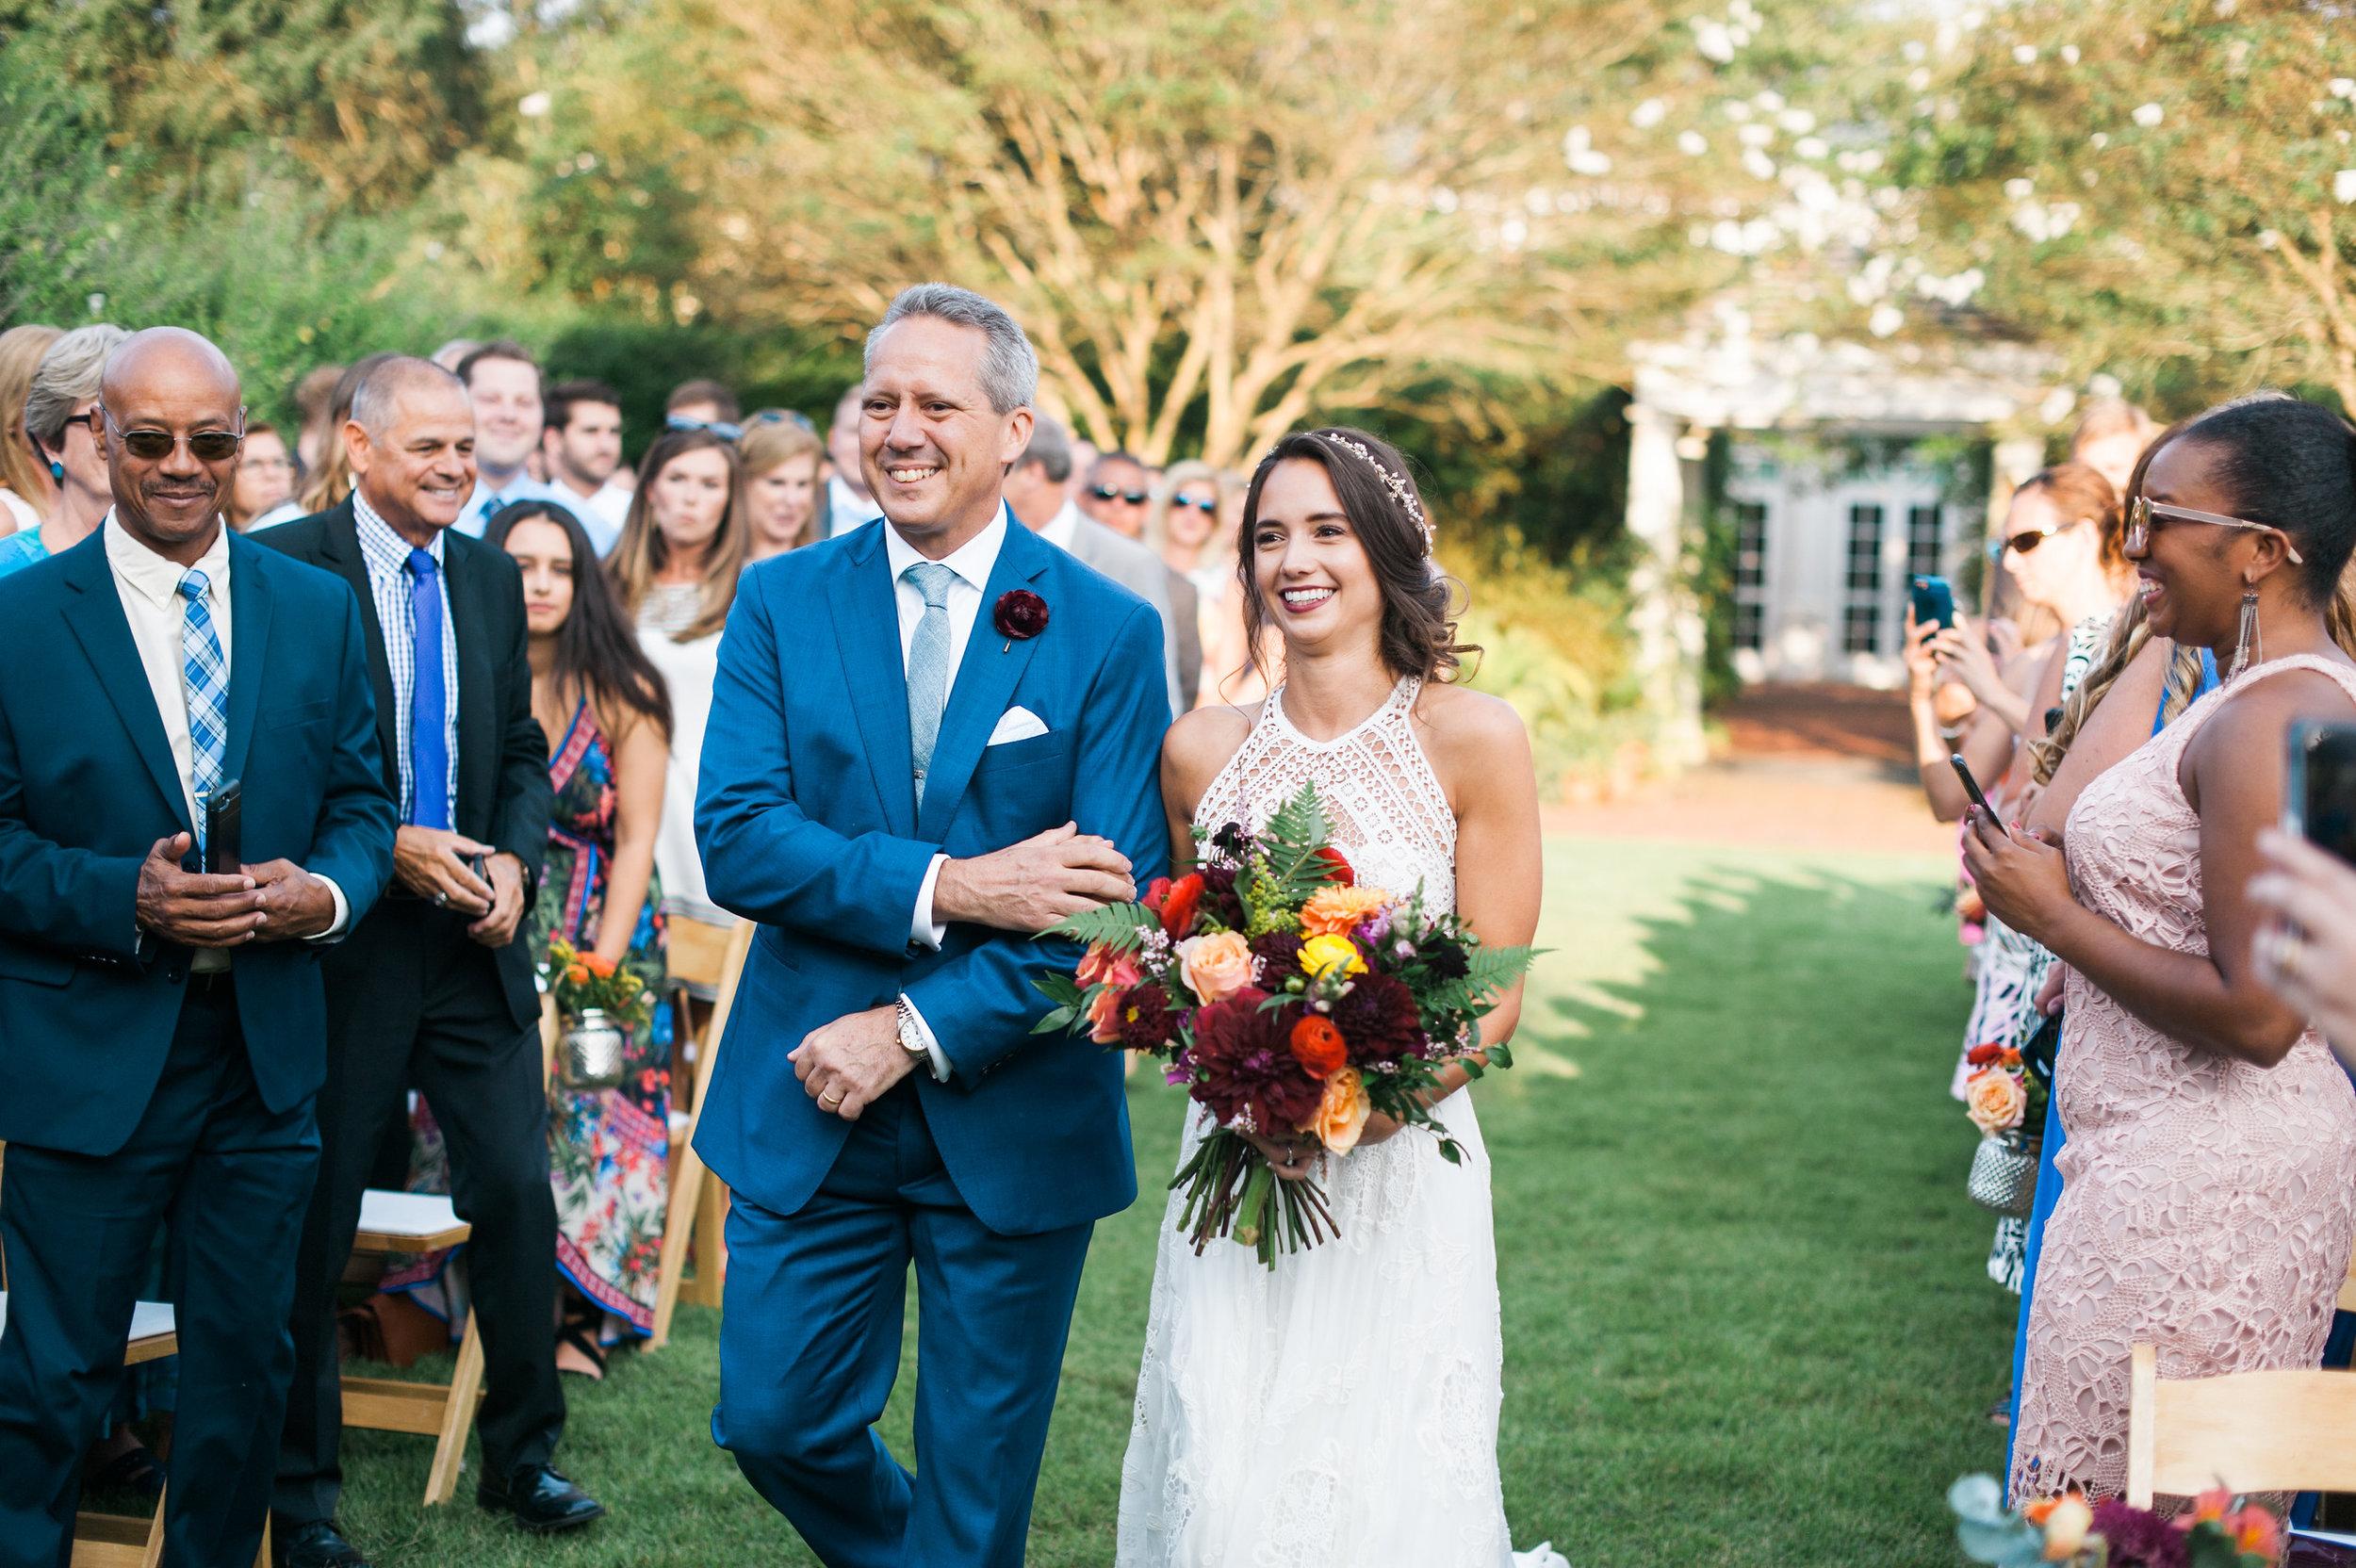 thomas-wedding-147-X5.jpg